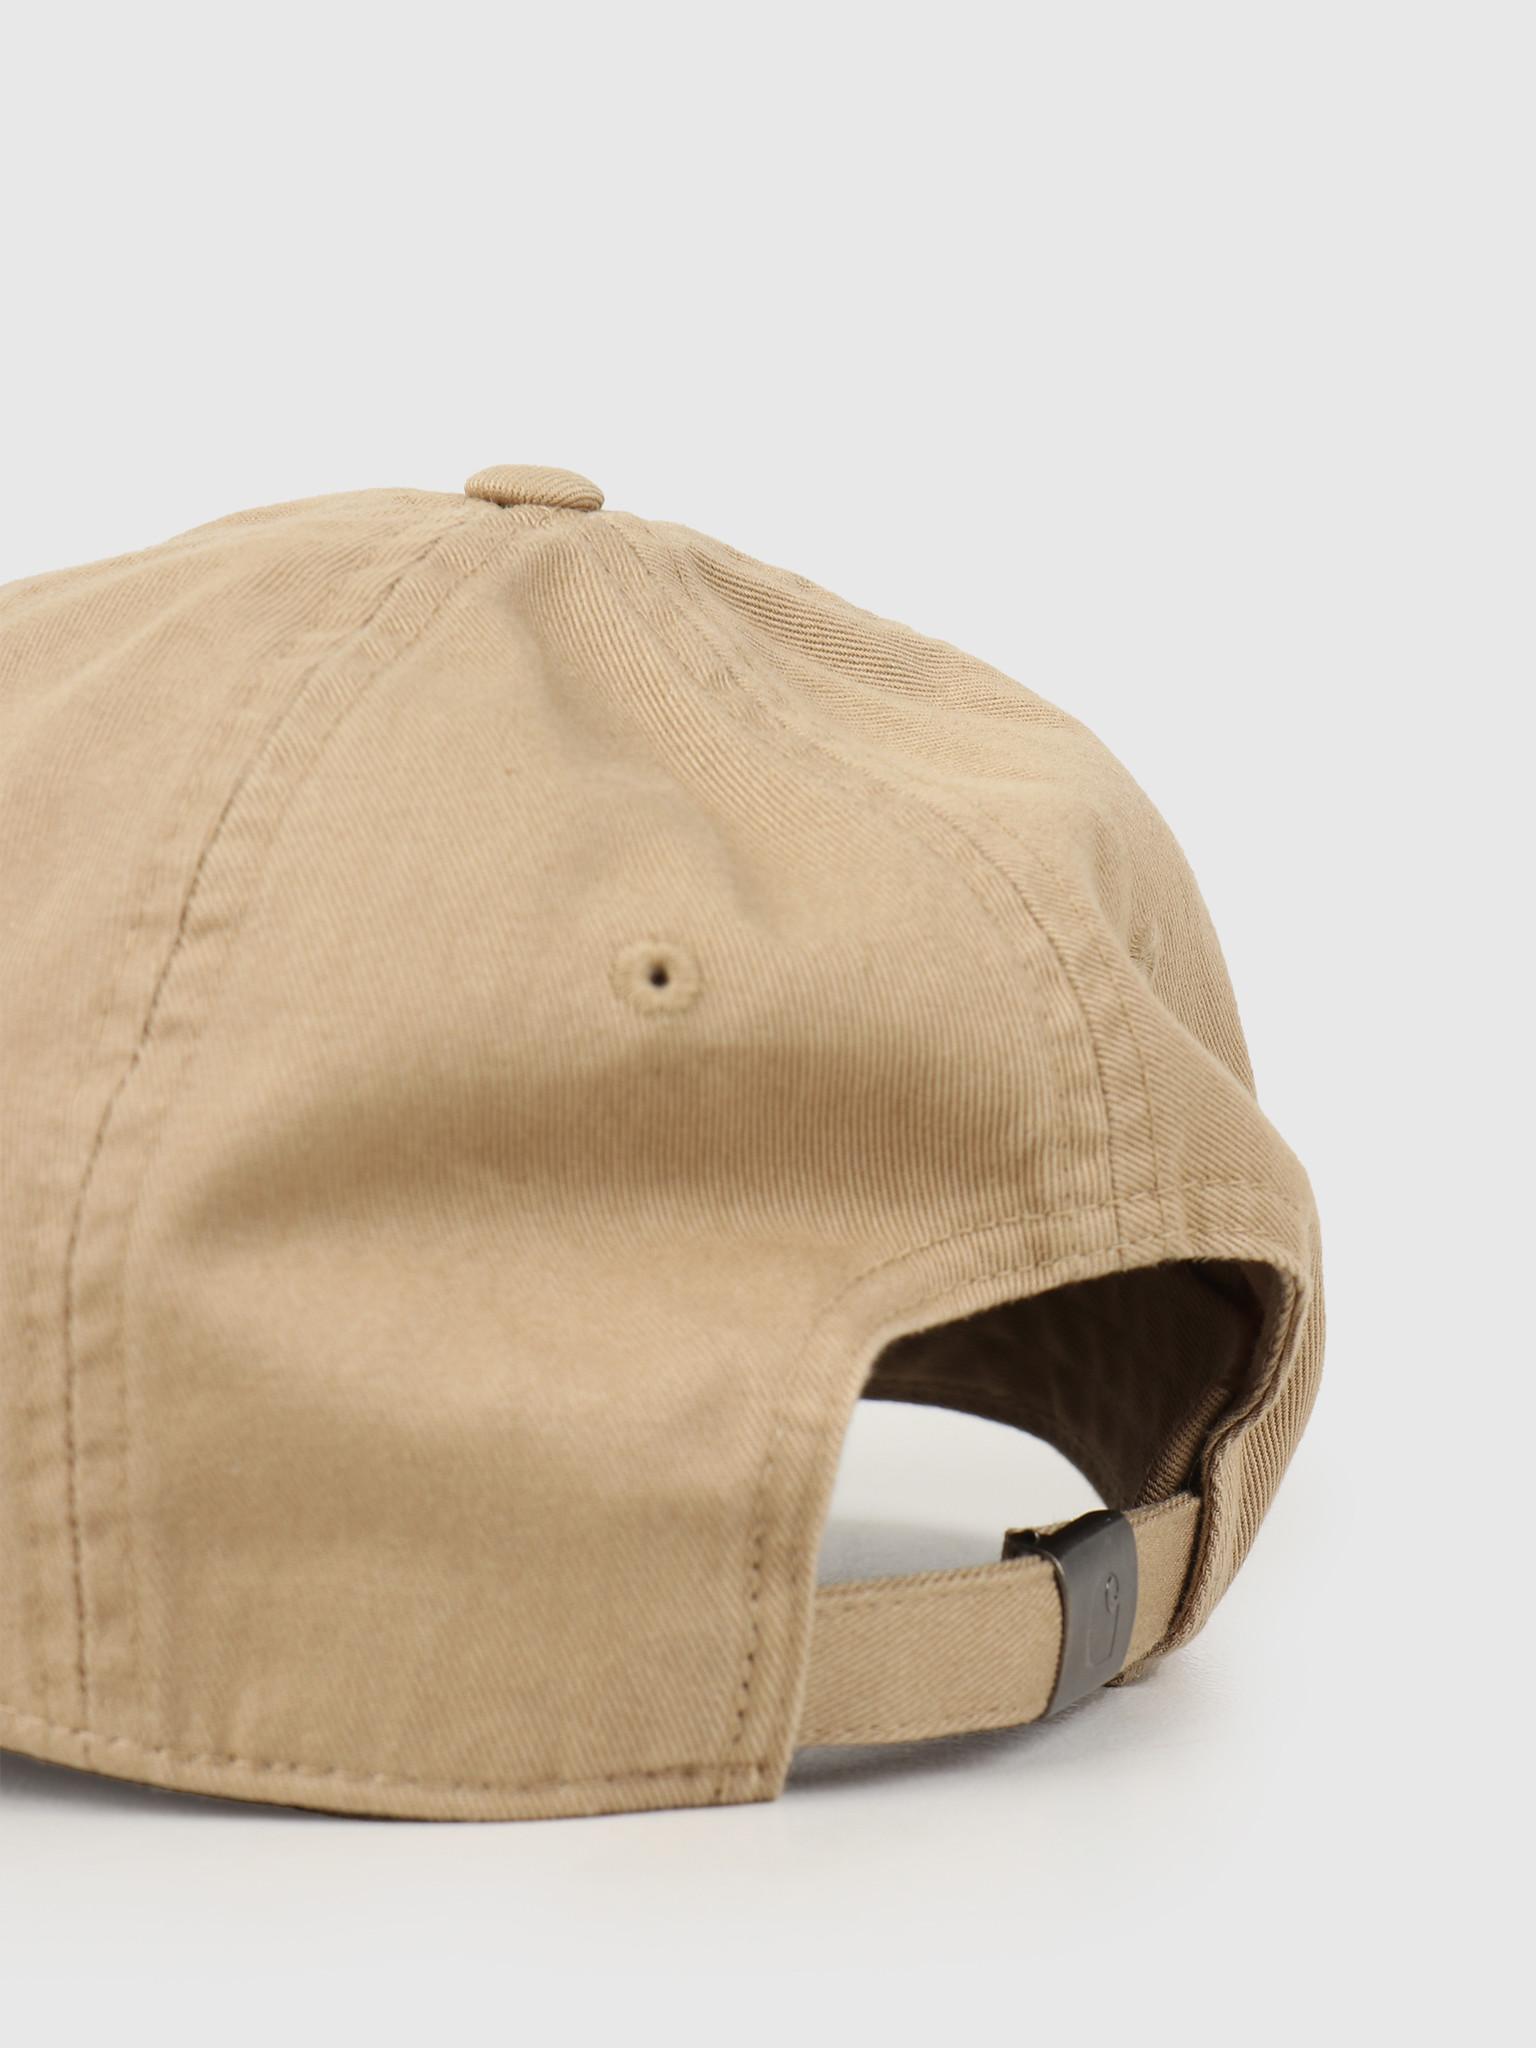 Carhartt WIP Carhartt WIP Madison Logo Cap Leather Black I023750-8Y90